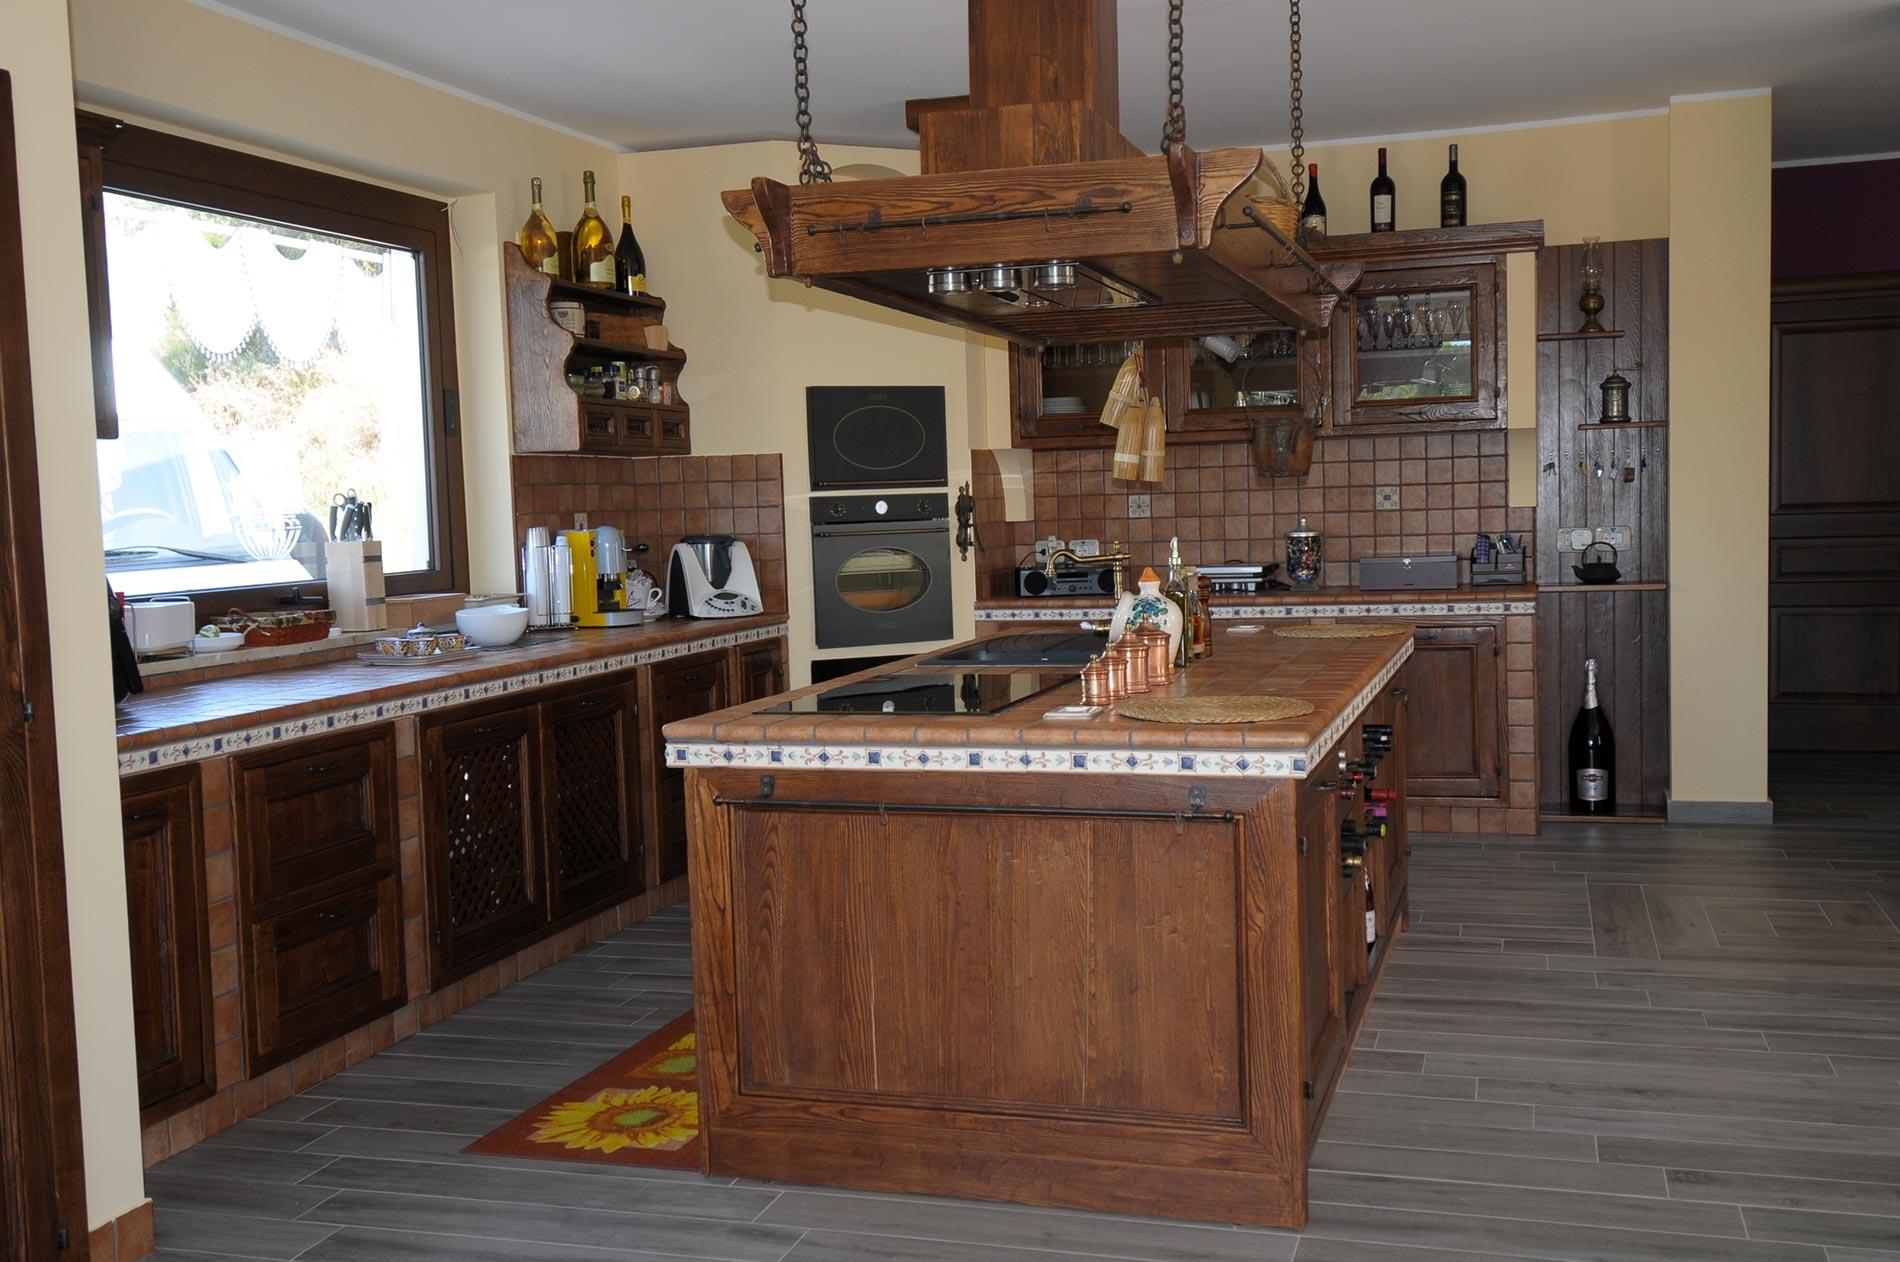 Cucina finta muratura tosca rivenditori cucine sicilia for Disegni di grandi cucine